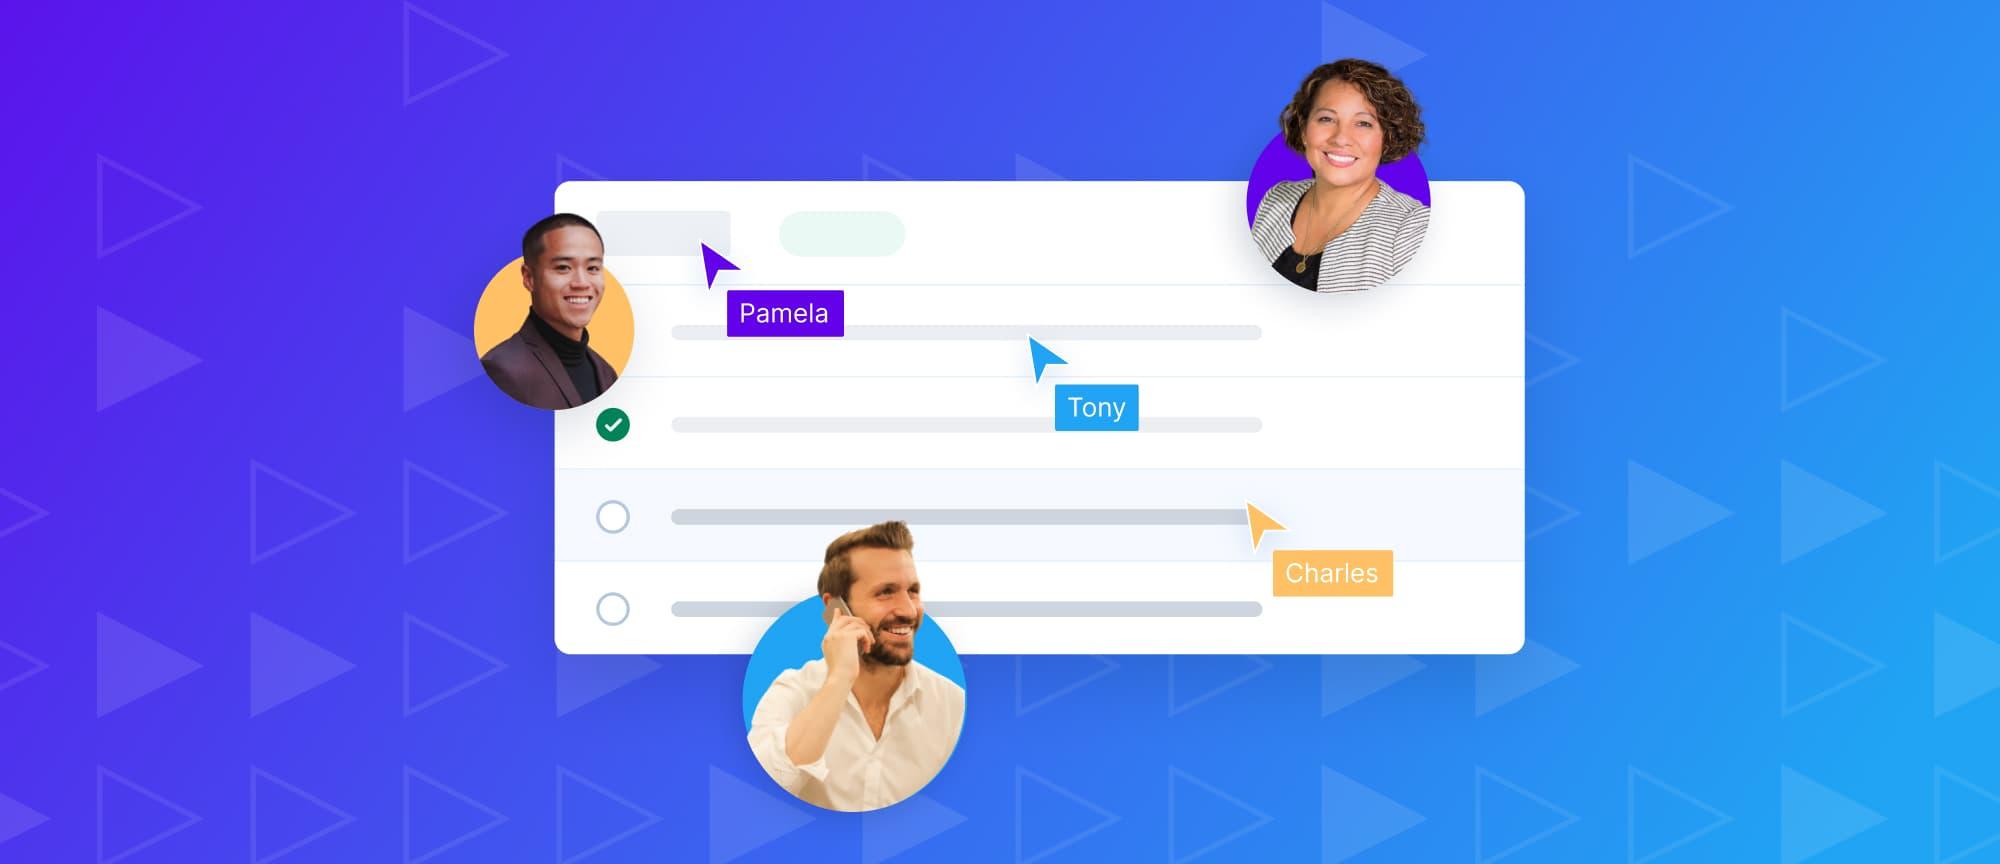 Transparent sales process - working together